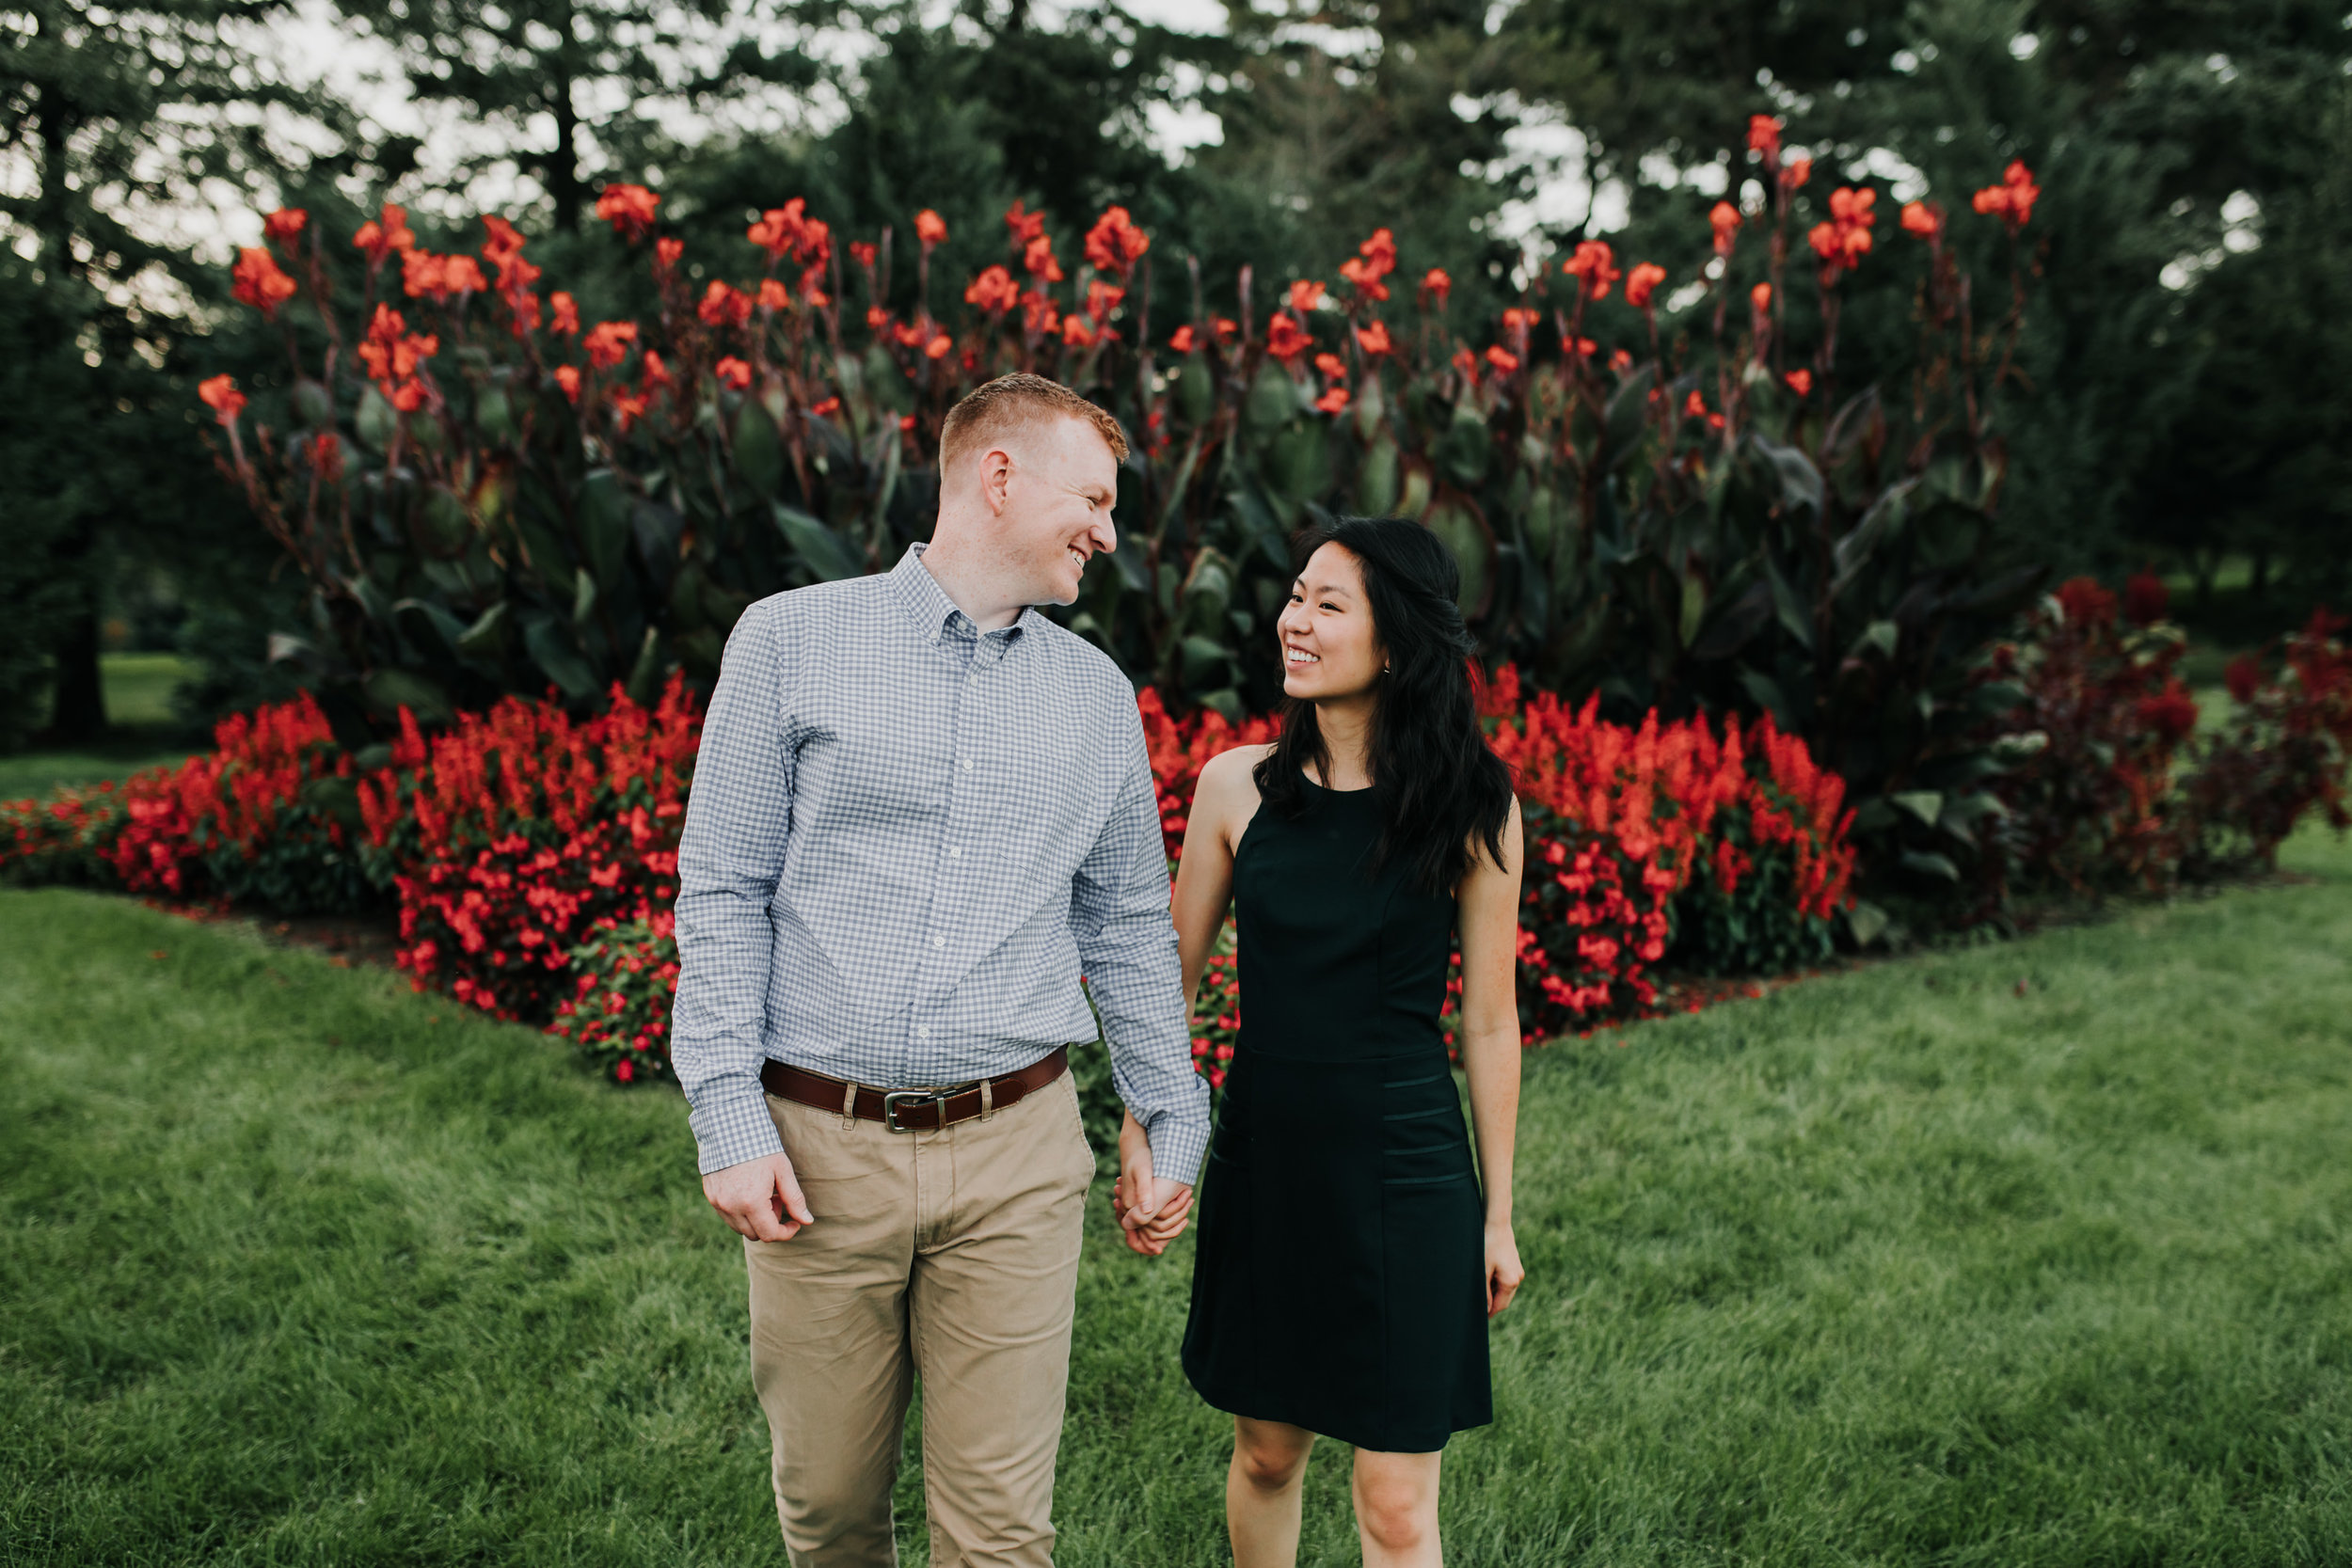 Catherin & Kyle - Married - Nathaniel Jensen Photography - Omaha Nebraska Wedding Photograper - Memorial Park - Joslyn Castle Engagement Session-73.jpg